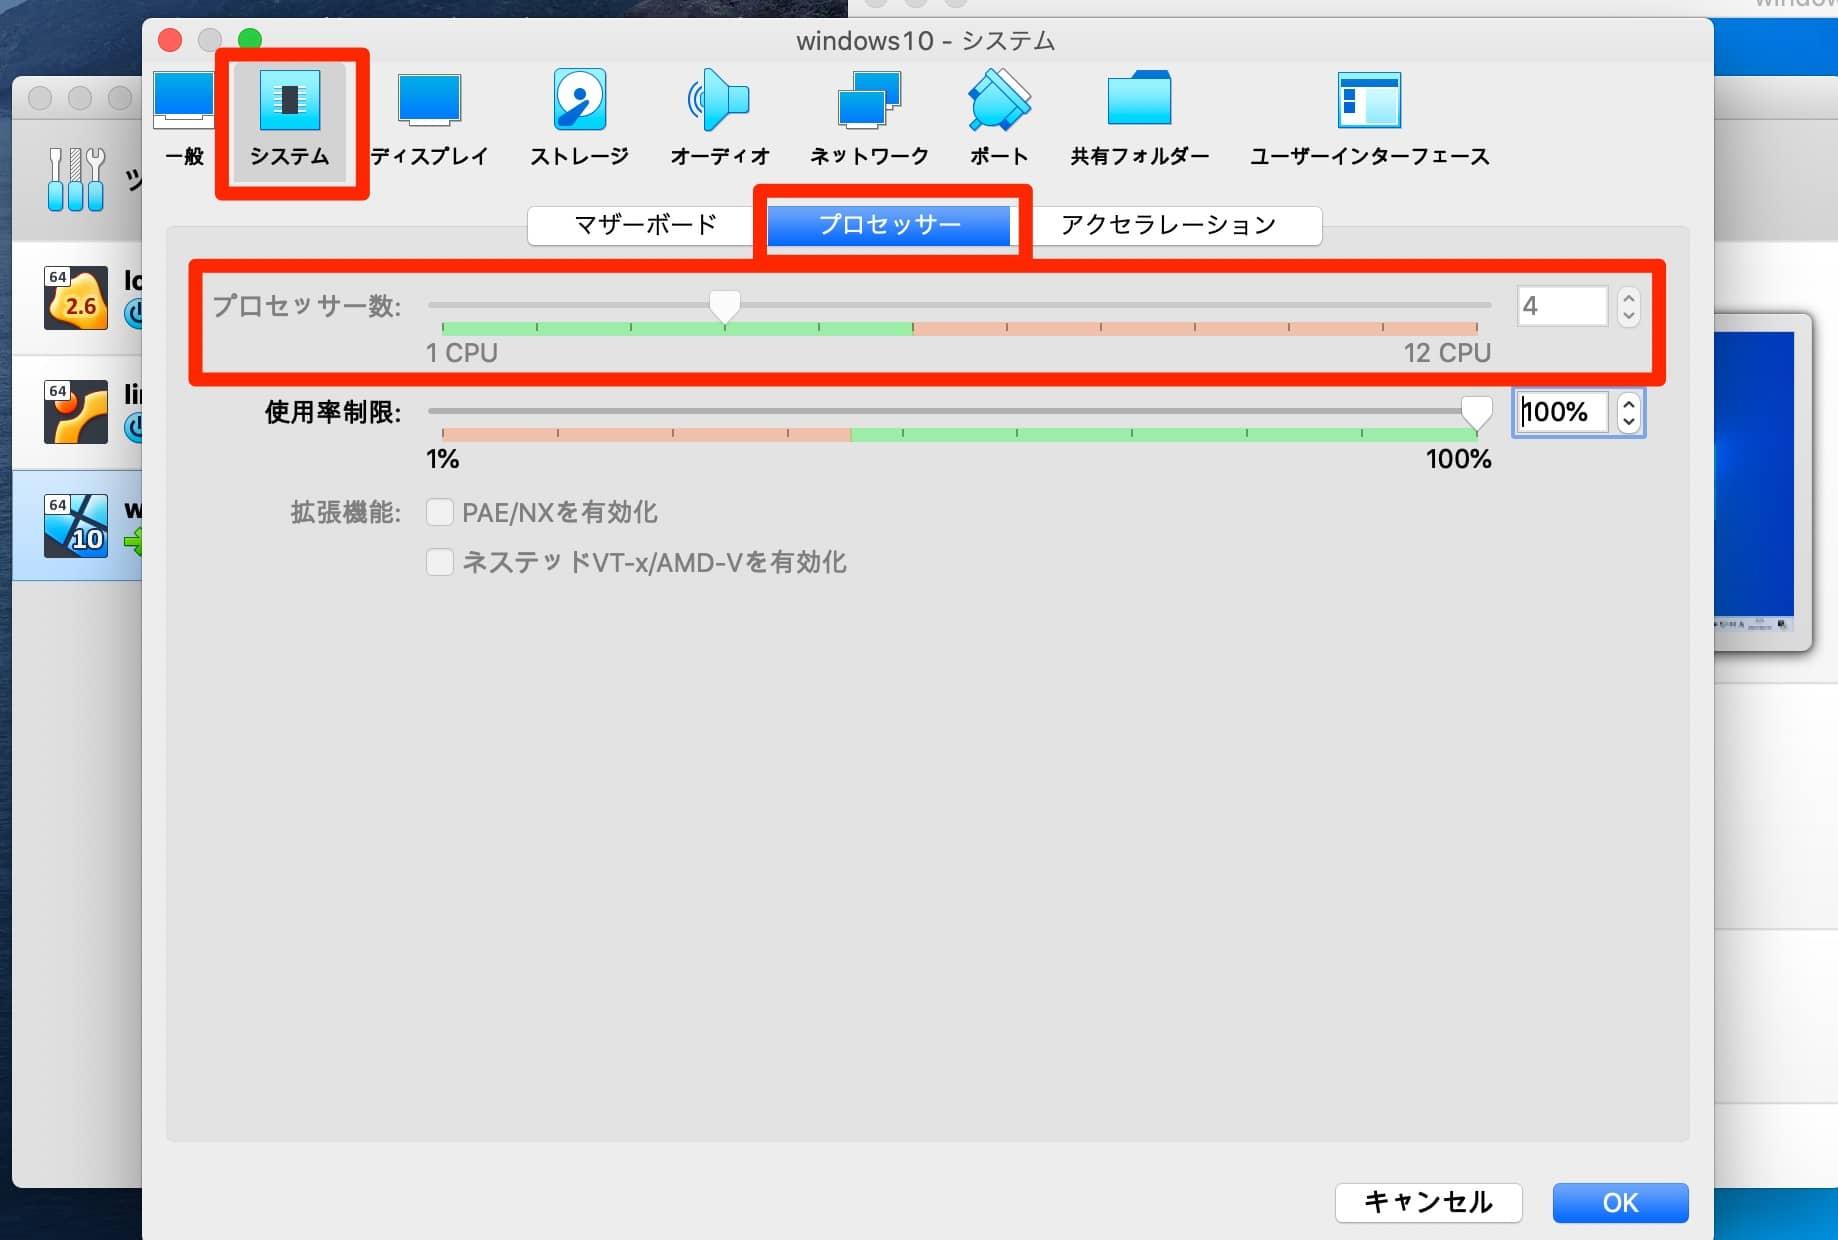 Windows10のCPUの数を変更